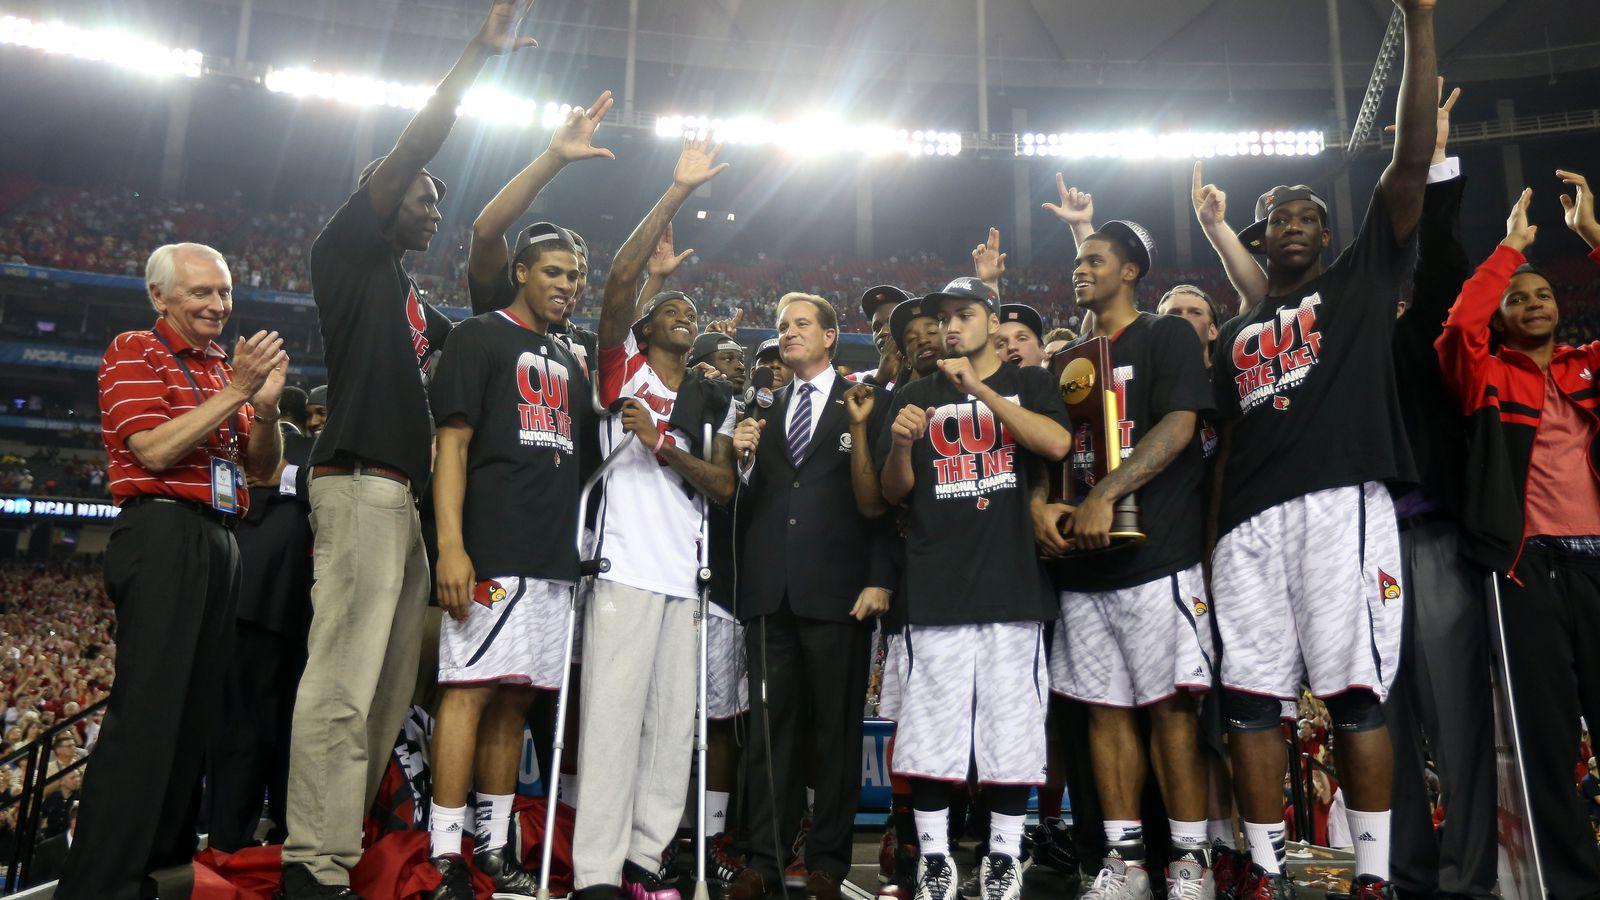 Kentucky Basketball One Shining Moment 2012: One Shining Moment 2013: Louisville Wins National Title